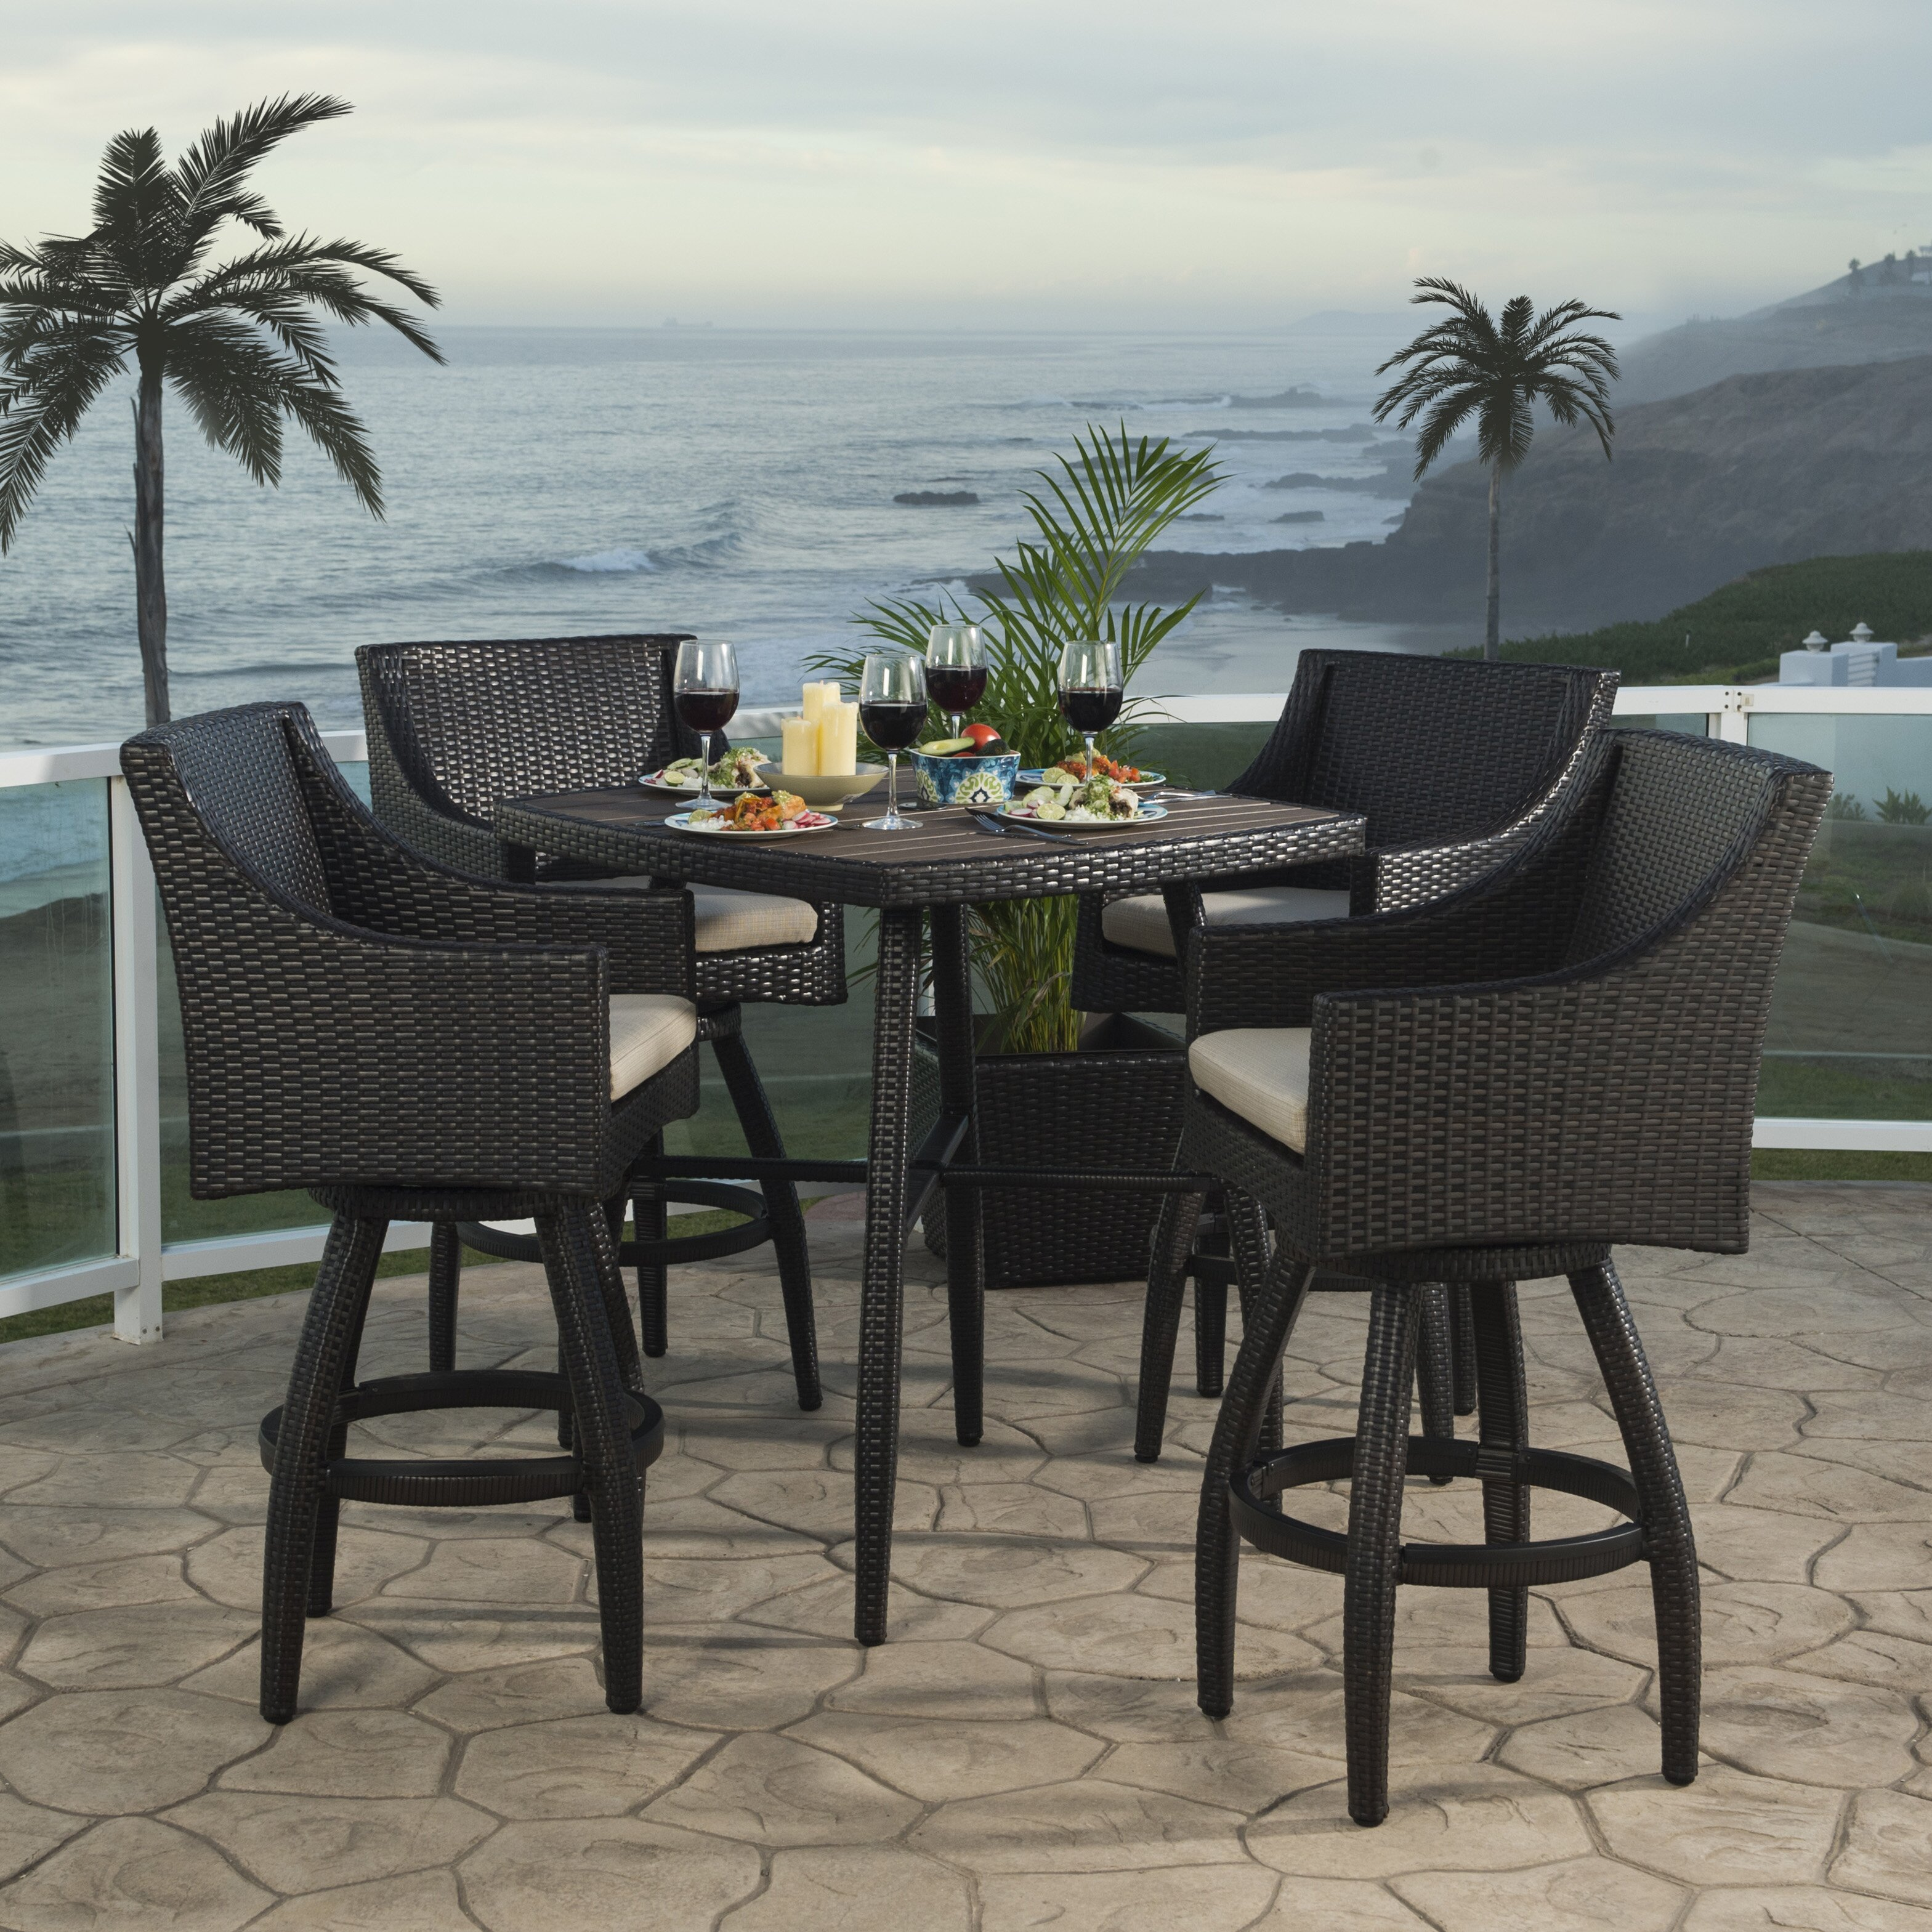 Patio Furniture Near Northridge Ca: Three Posts Northridge 5 Piece Bar Set